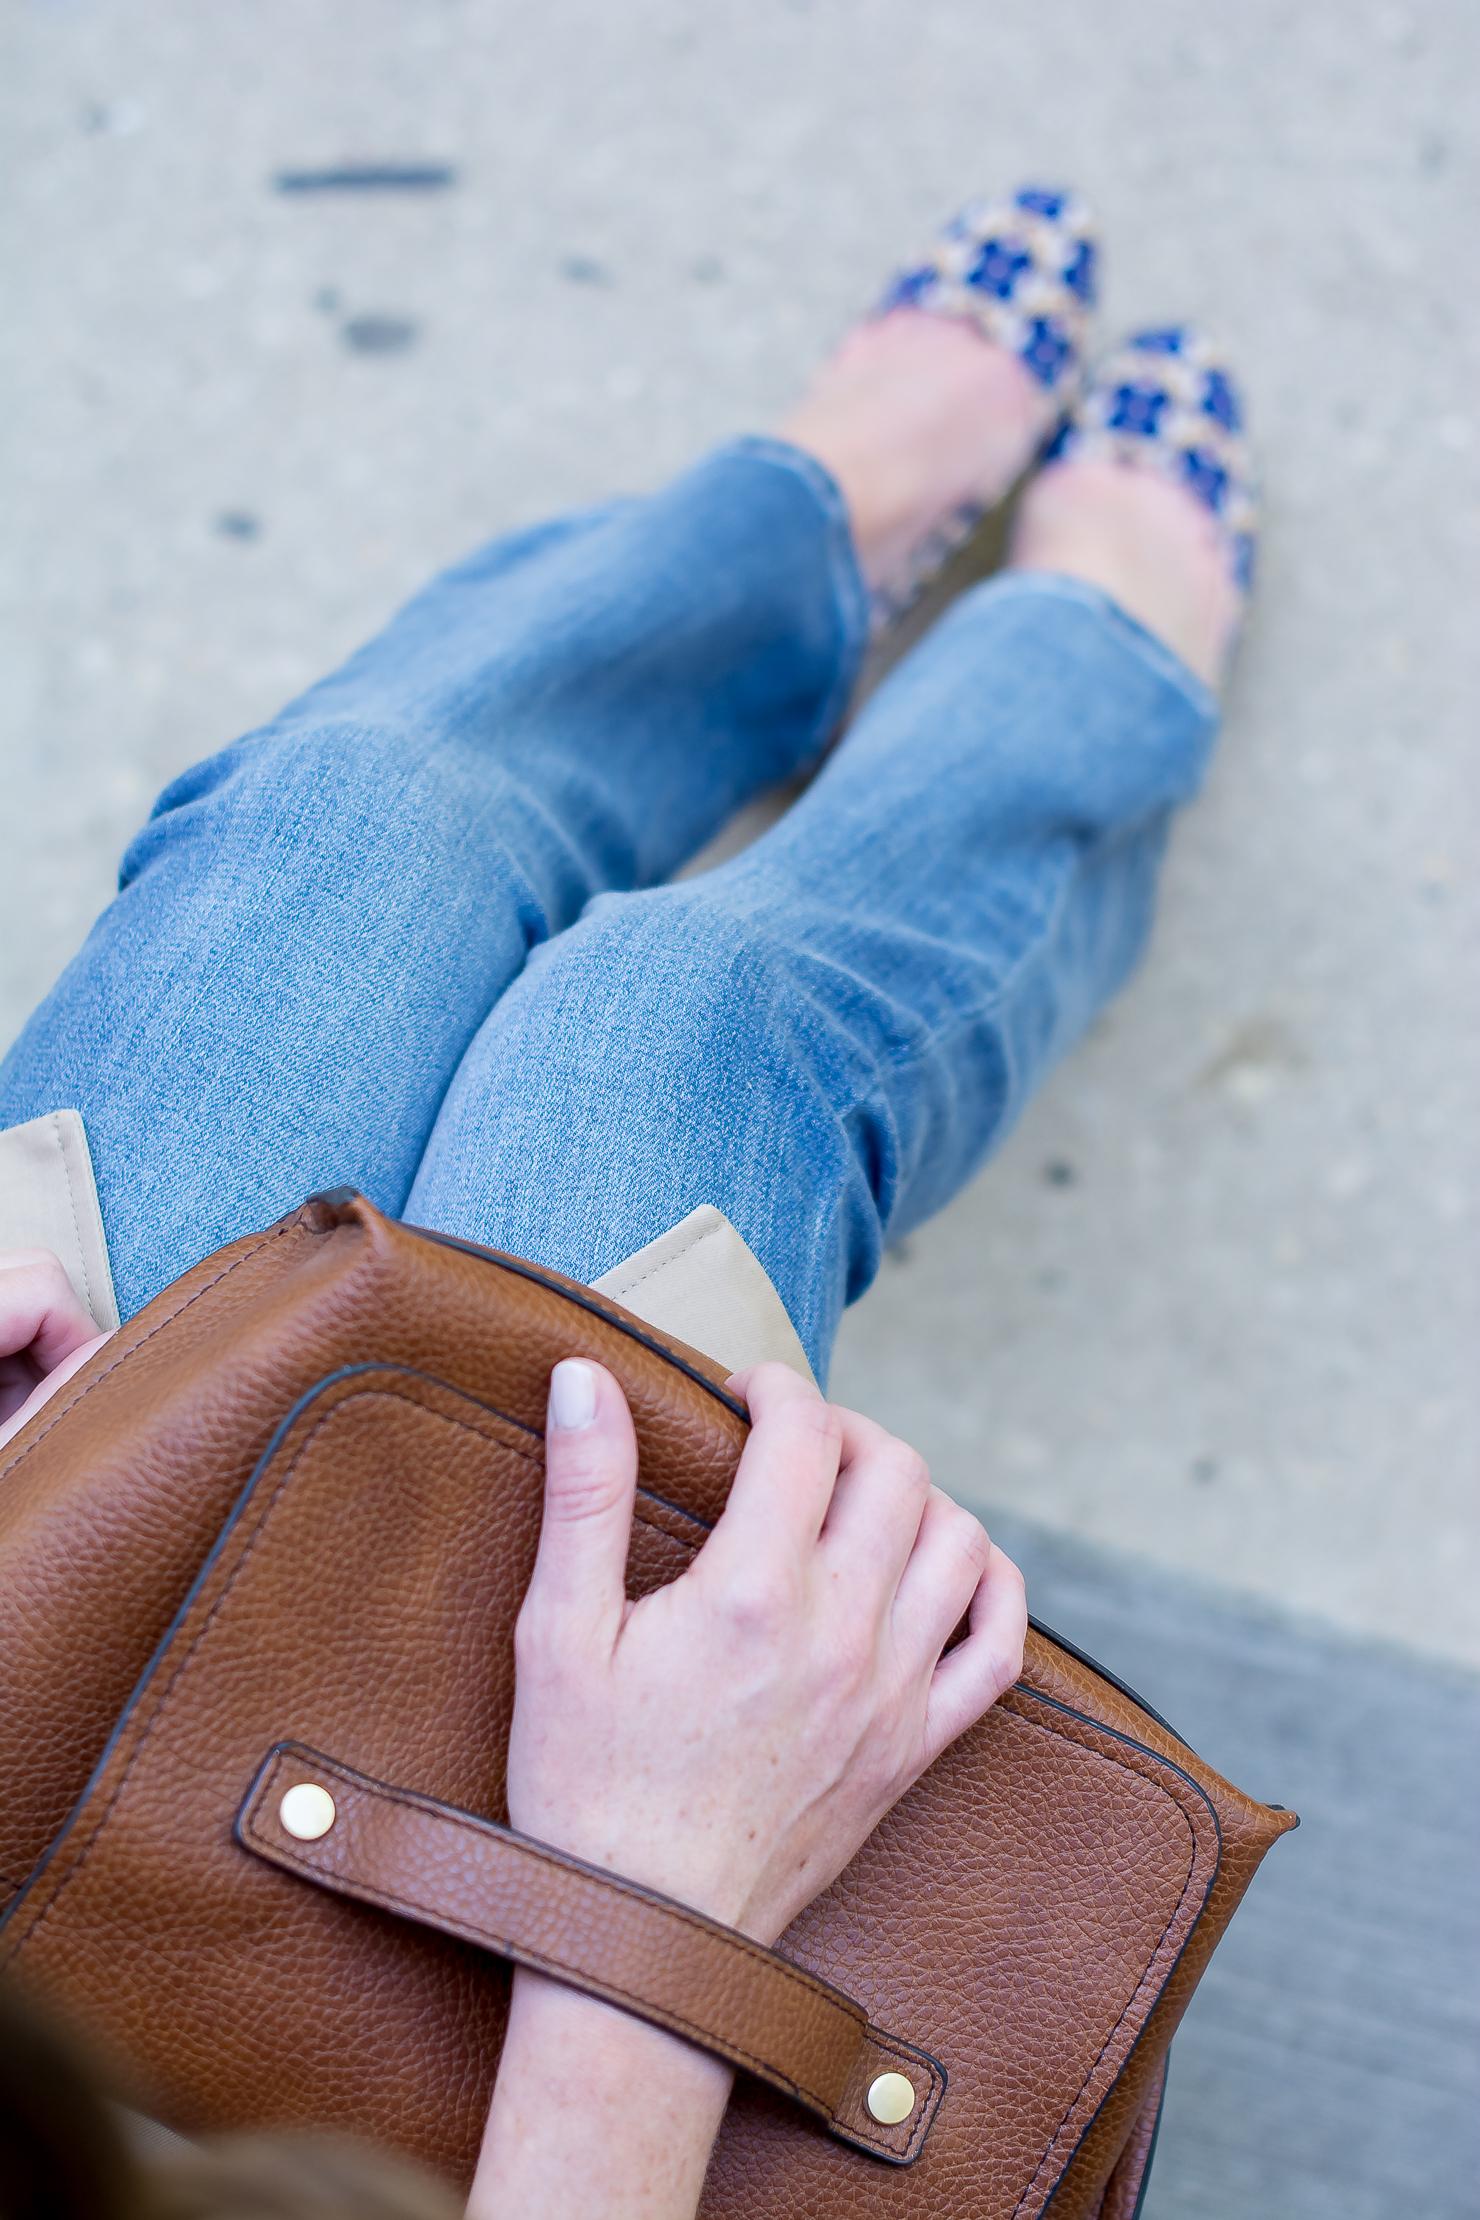 jcrew-cape-trench-dark-blue-chambray-hm-kick-flare-jeans-nine-west-printed-round-toe-pumps-zara-clutch-18